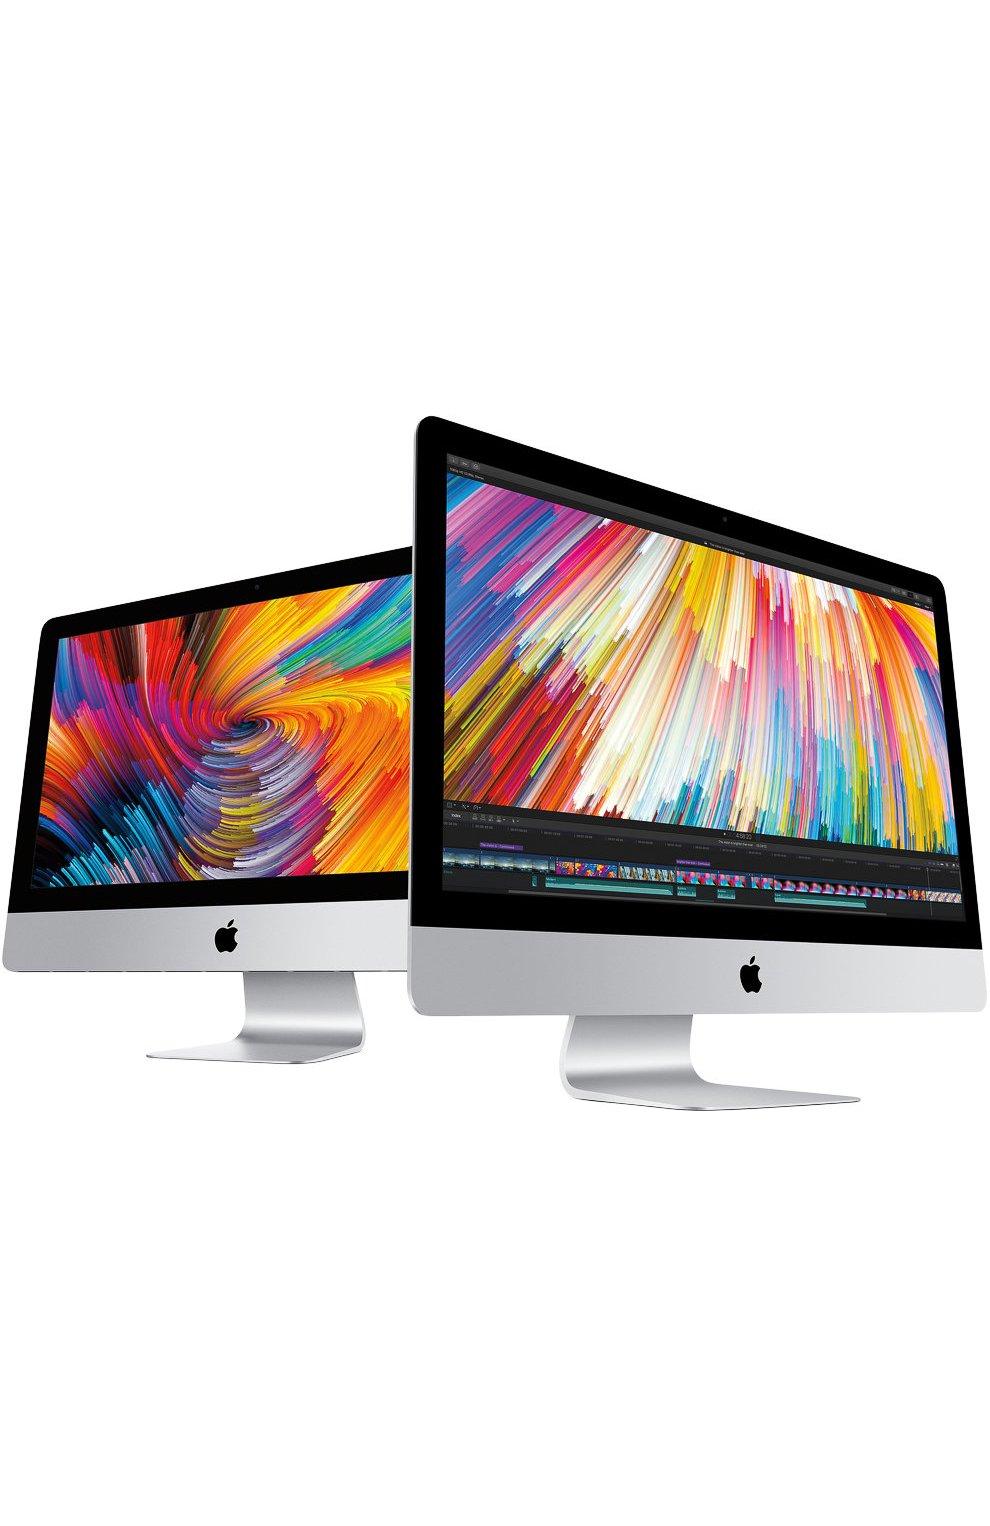 "iMac 21.5"" с дисплеем 4K Retina Quad-core i5 3.4GHz 1TB Apple  | Фото №3"